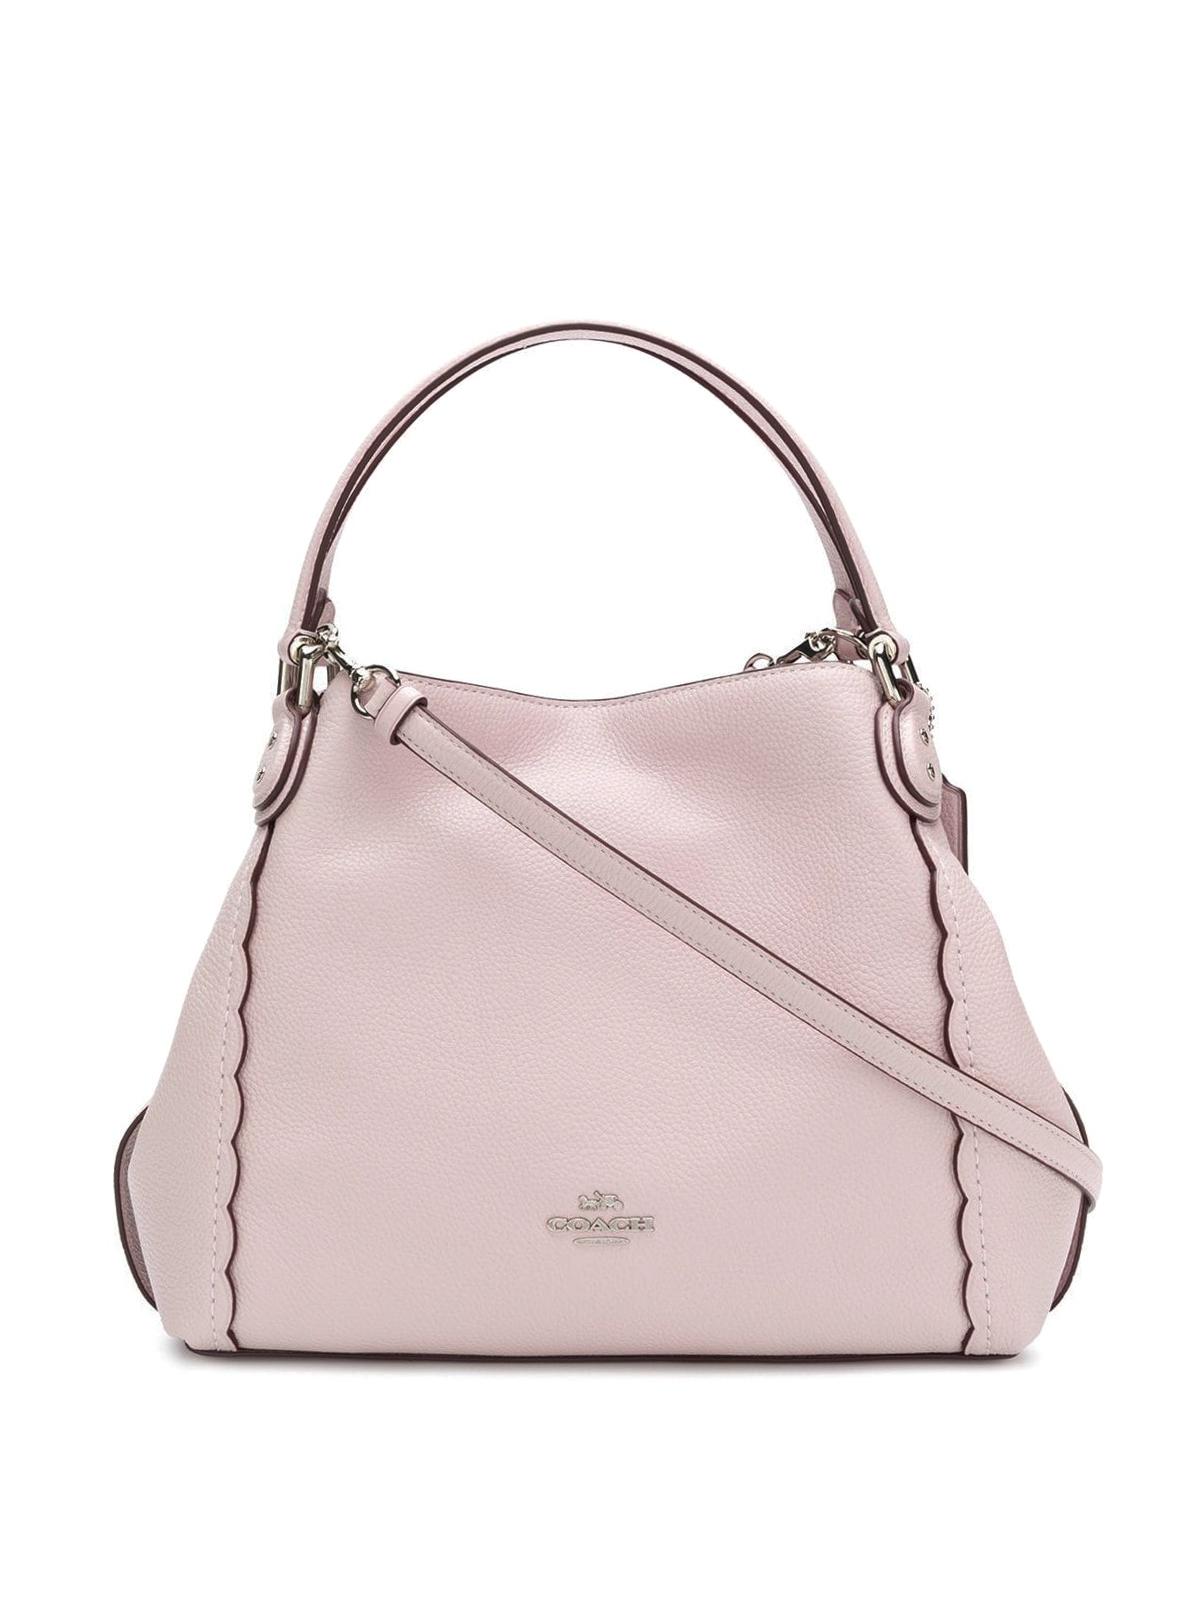 3cd4e101d ... reduced coach shoulder bags pale pink leather shoulder bag 54700 19a49